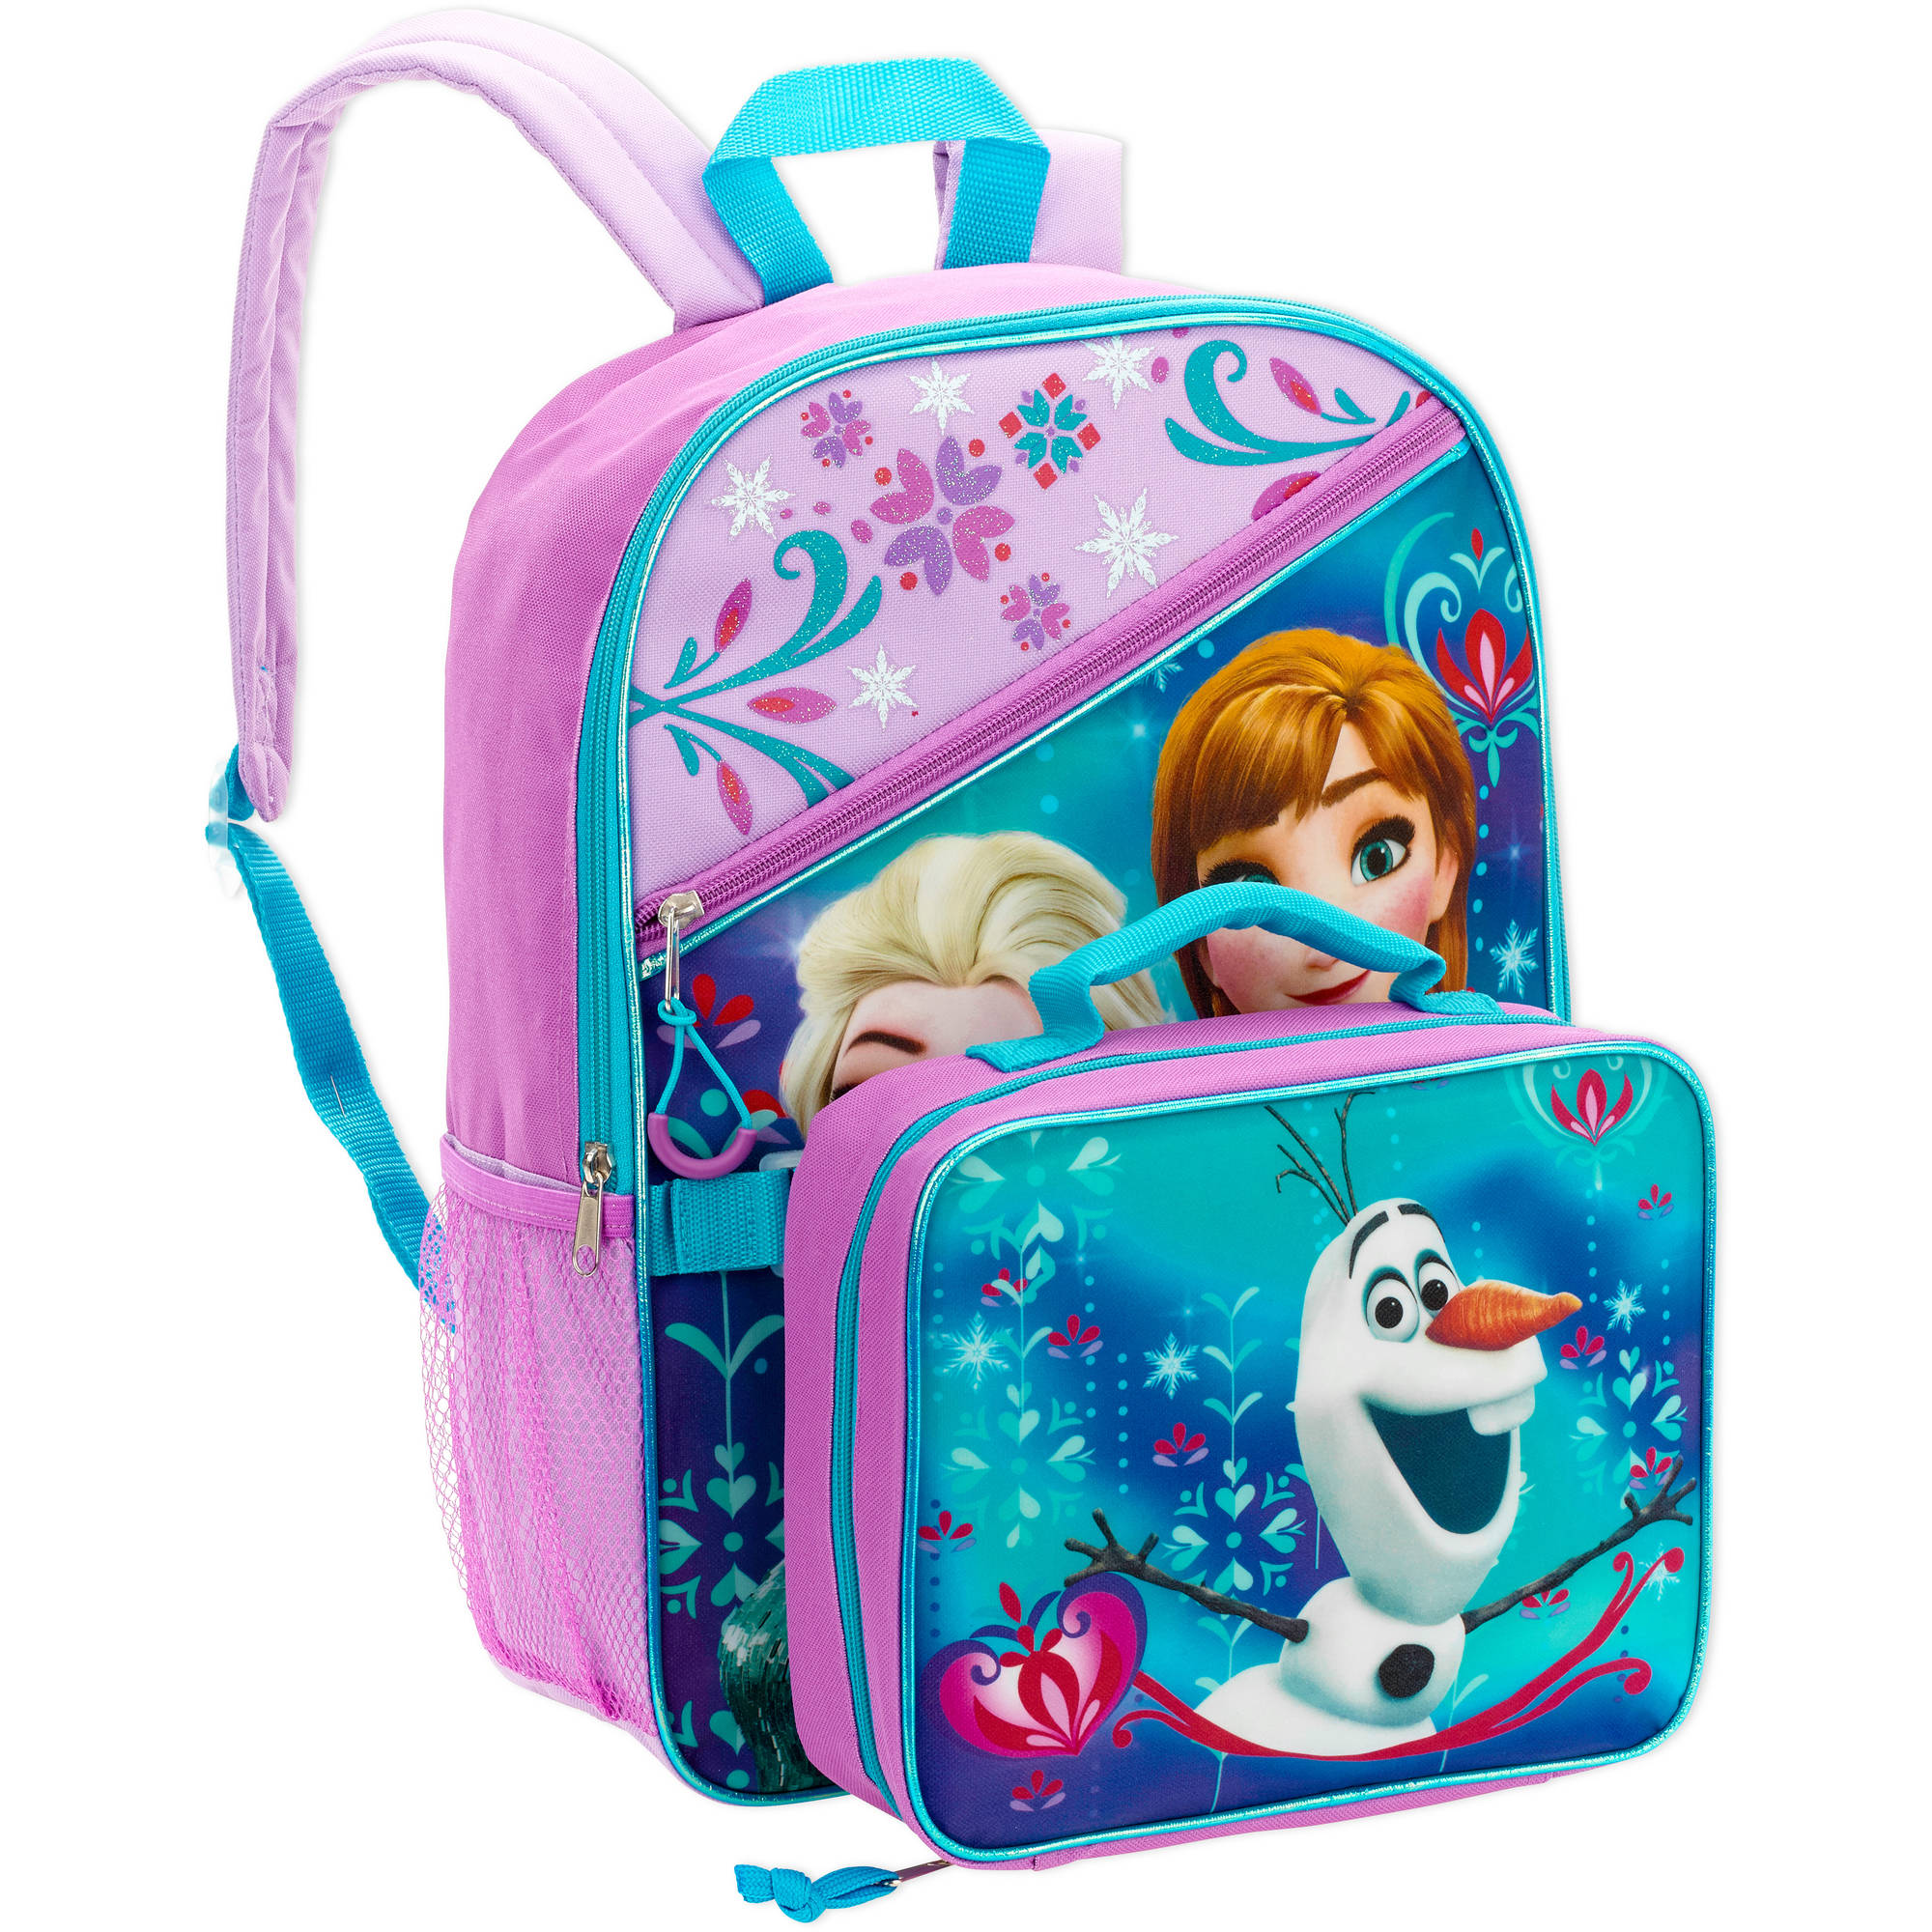 e45042c0e3d Disney - Frozen 16 Inch Full Size Backpack w  Detachable Lunch Bag -  Walmart.com